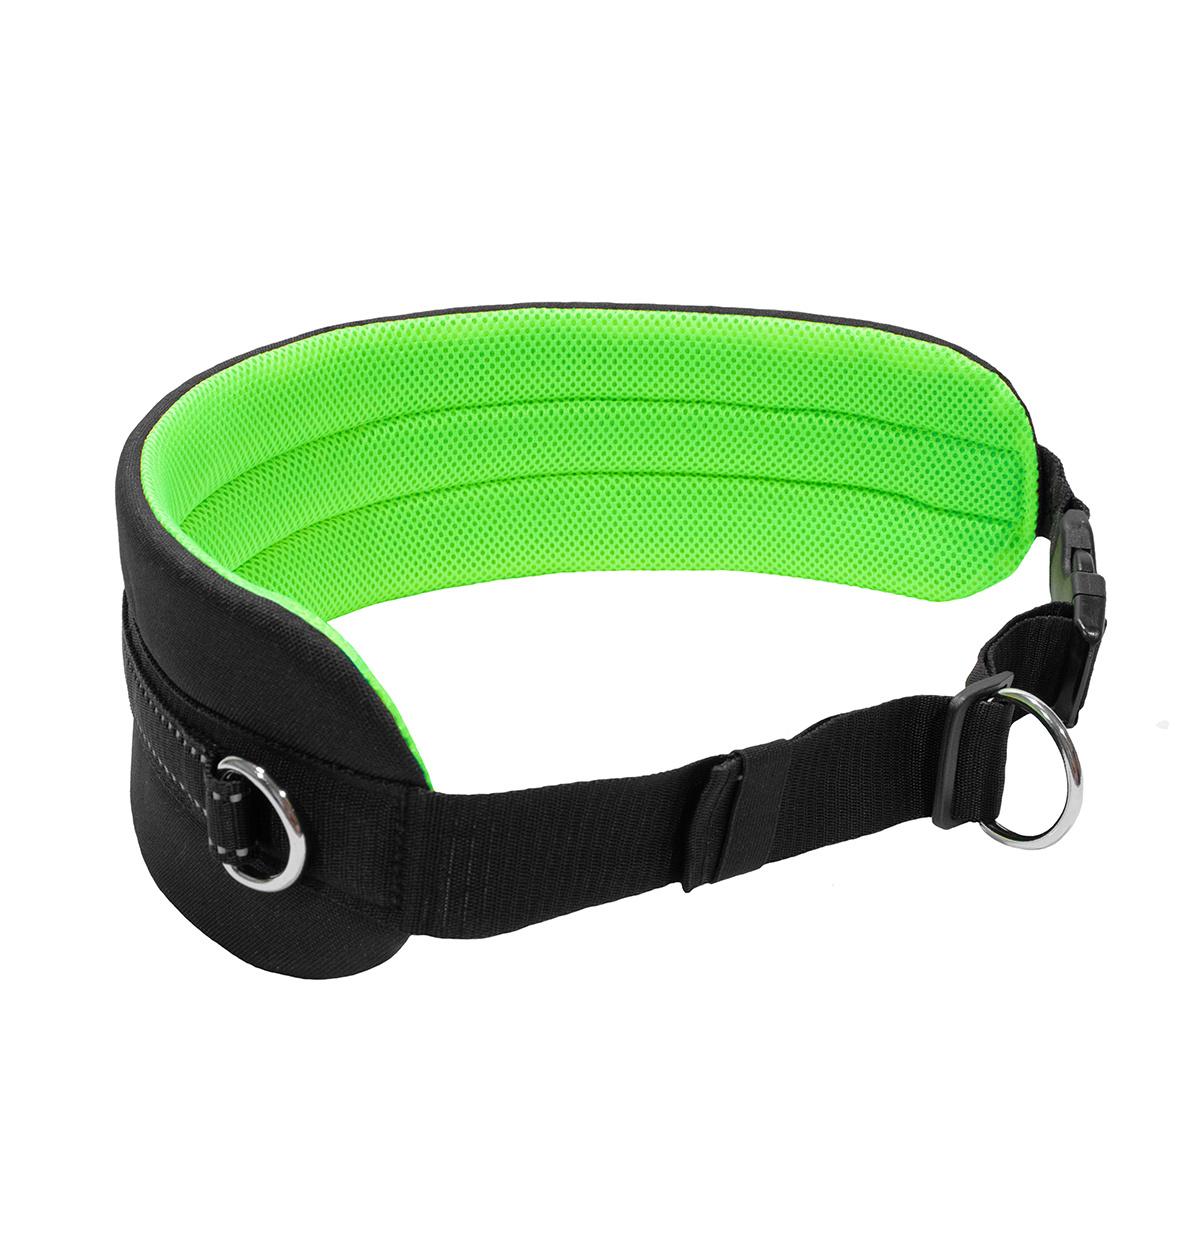 LasaLine Handsfree Dog Walking Running Jogging Waist Belt -  neon green Pedding/ black with reflectors